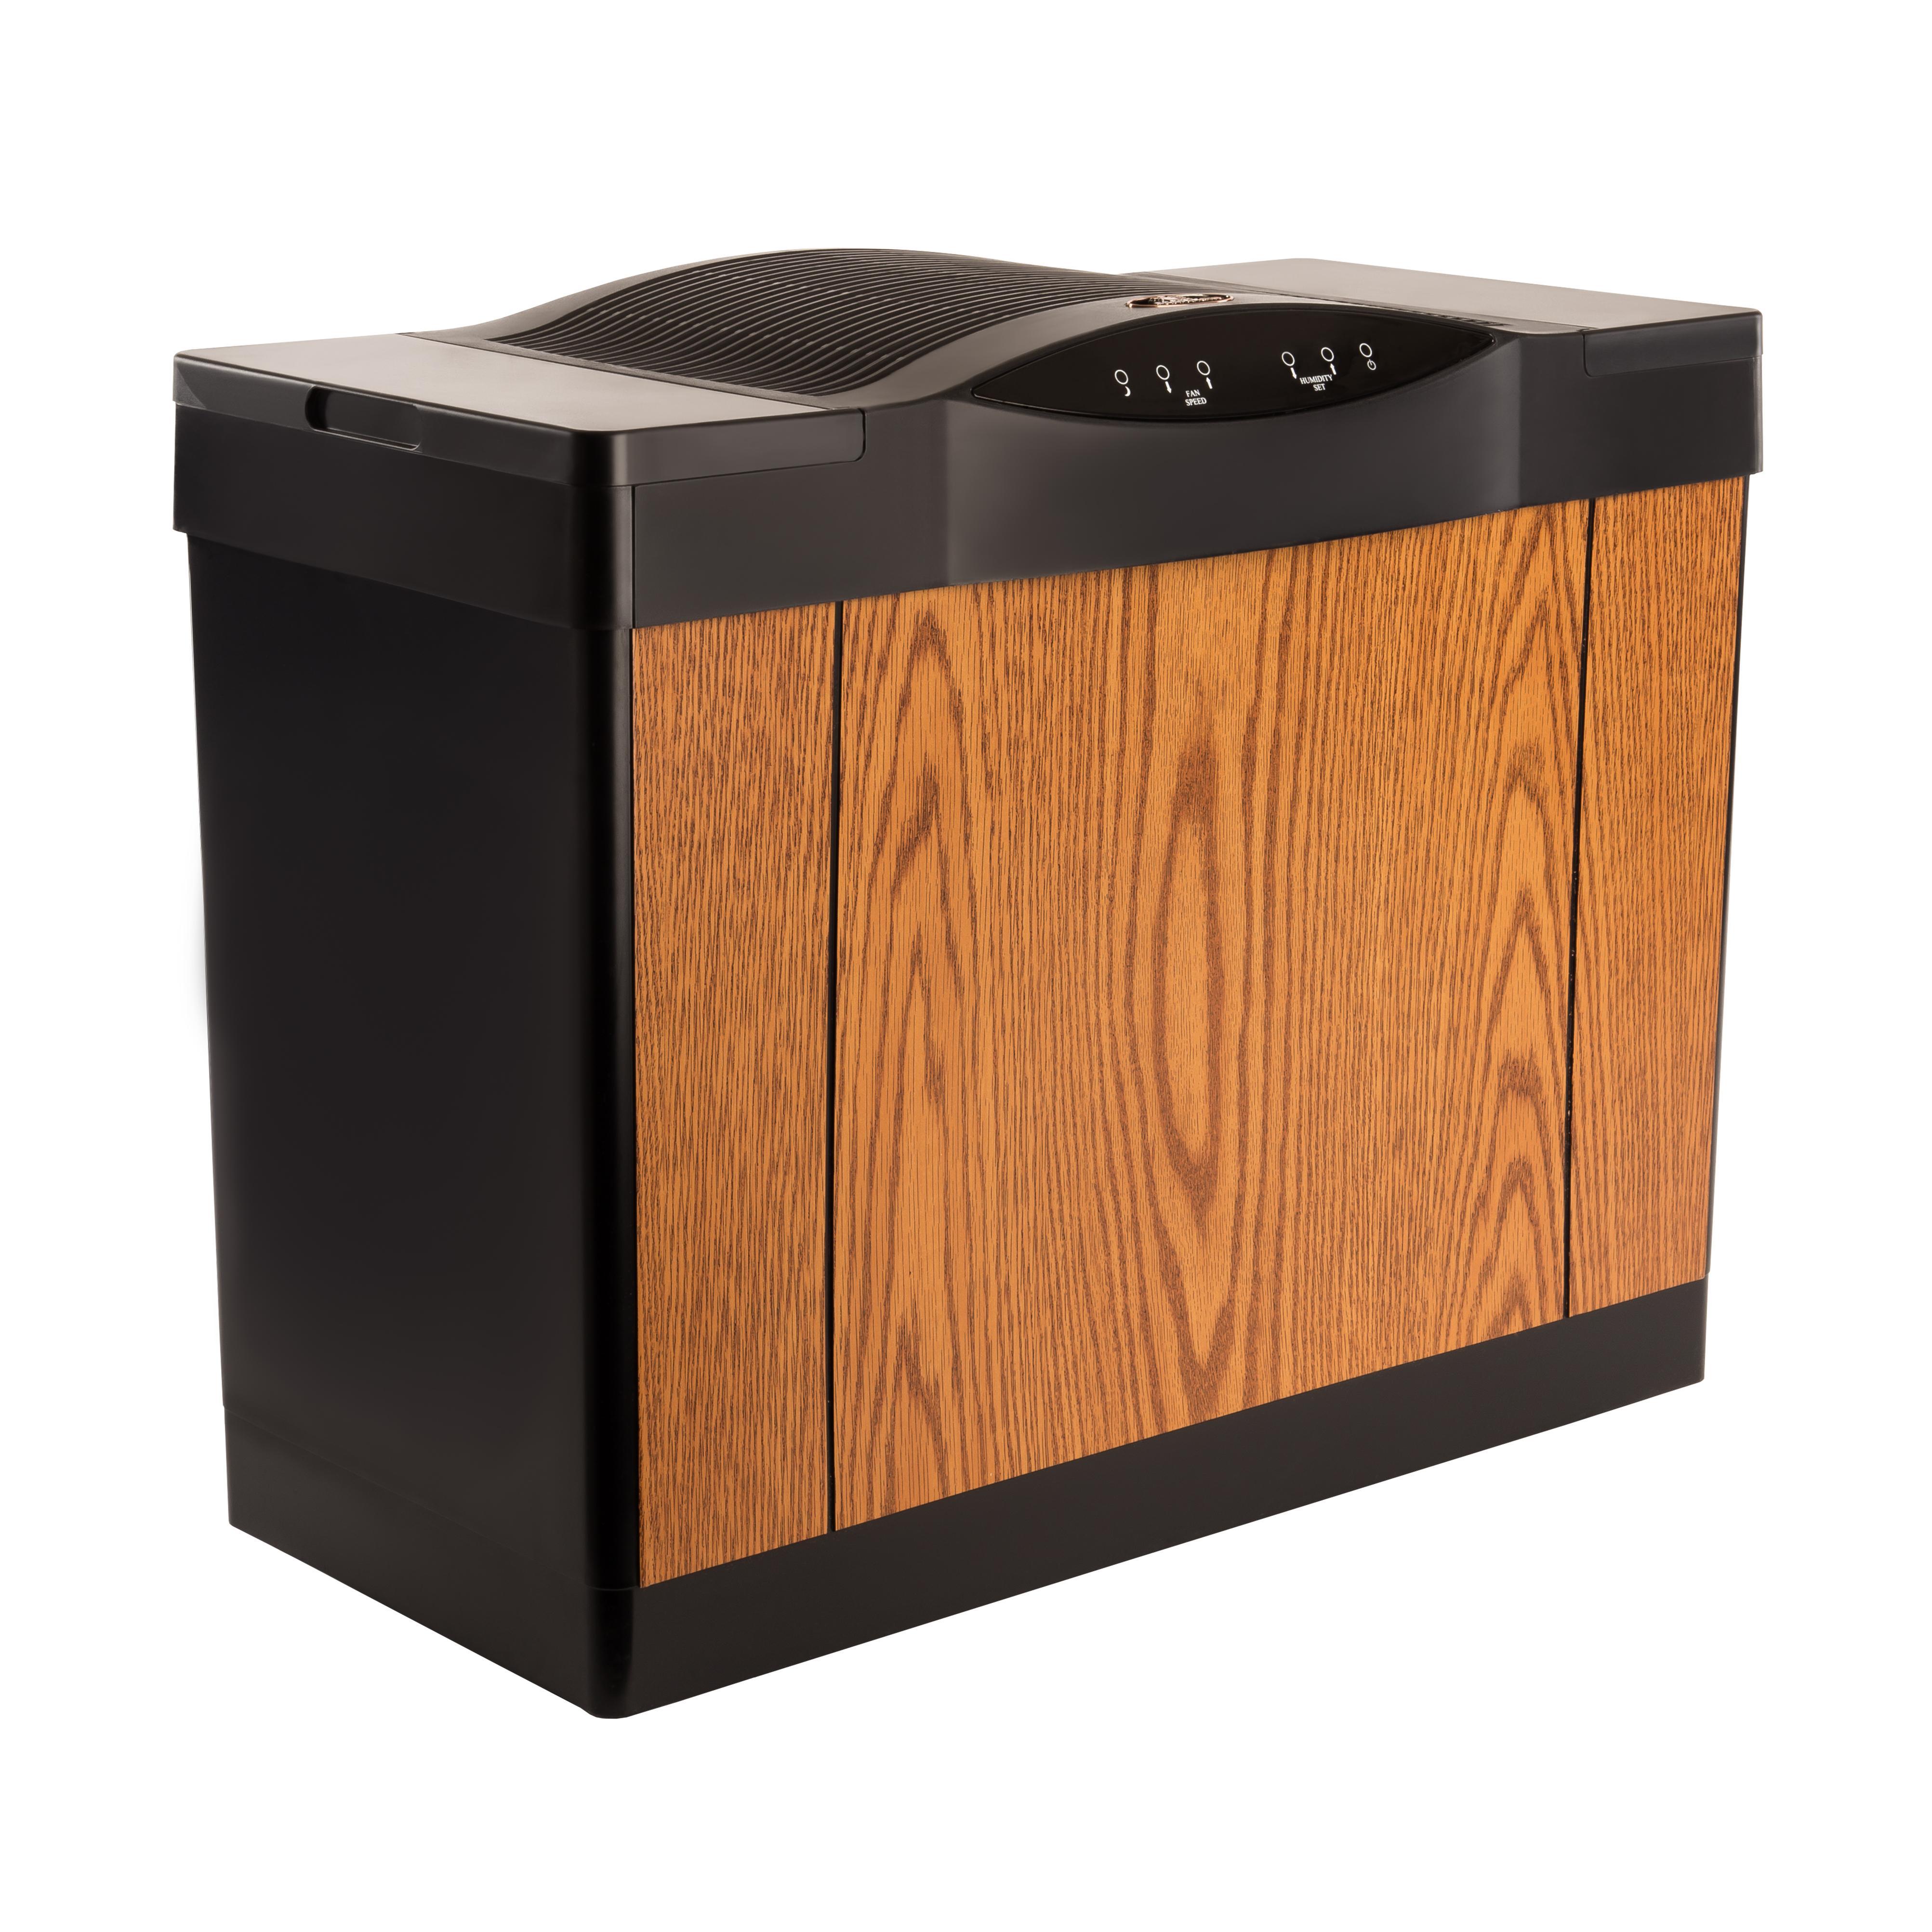 Humidifier Light Oak Black Trim Single Room Humidifiers #9E5D2D